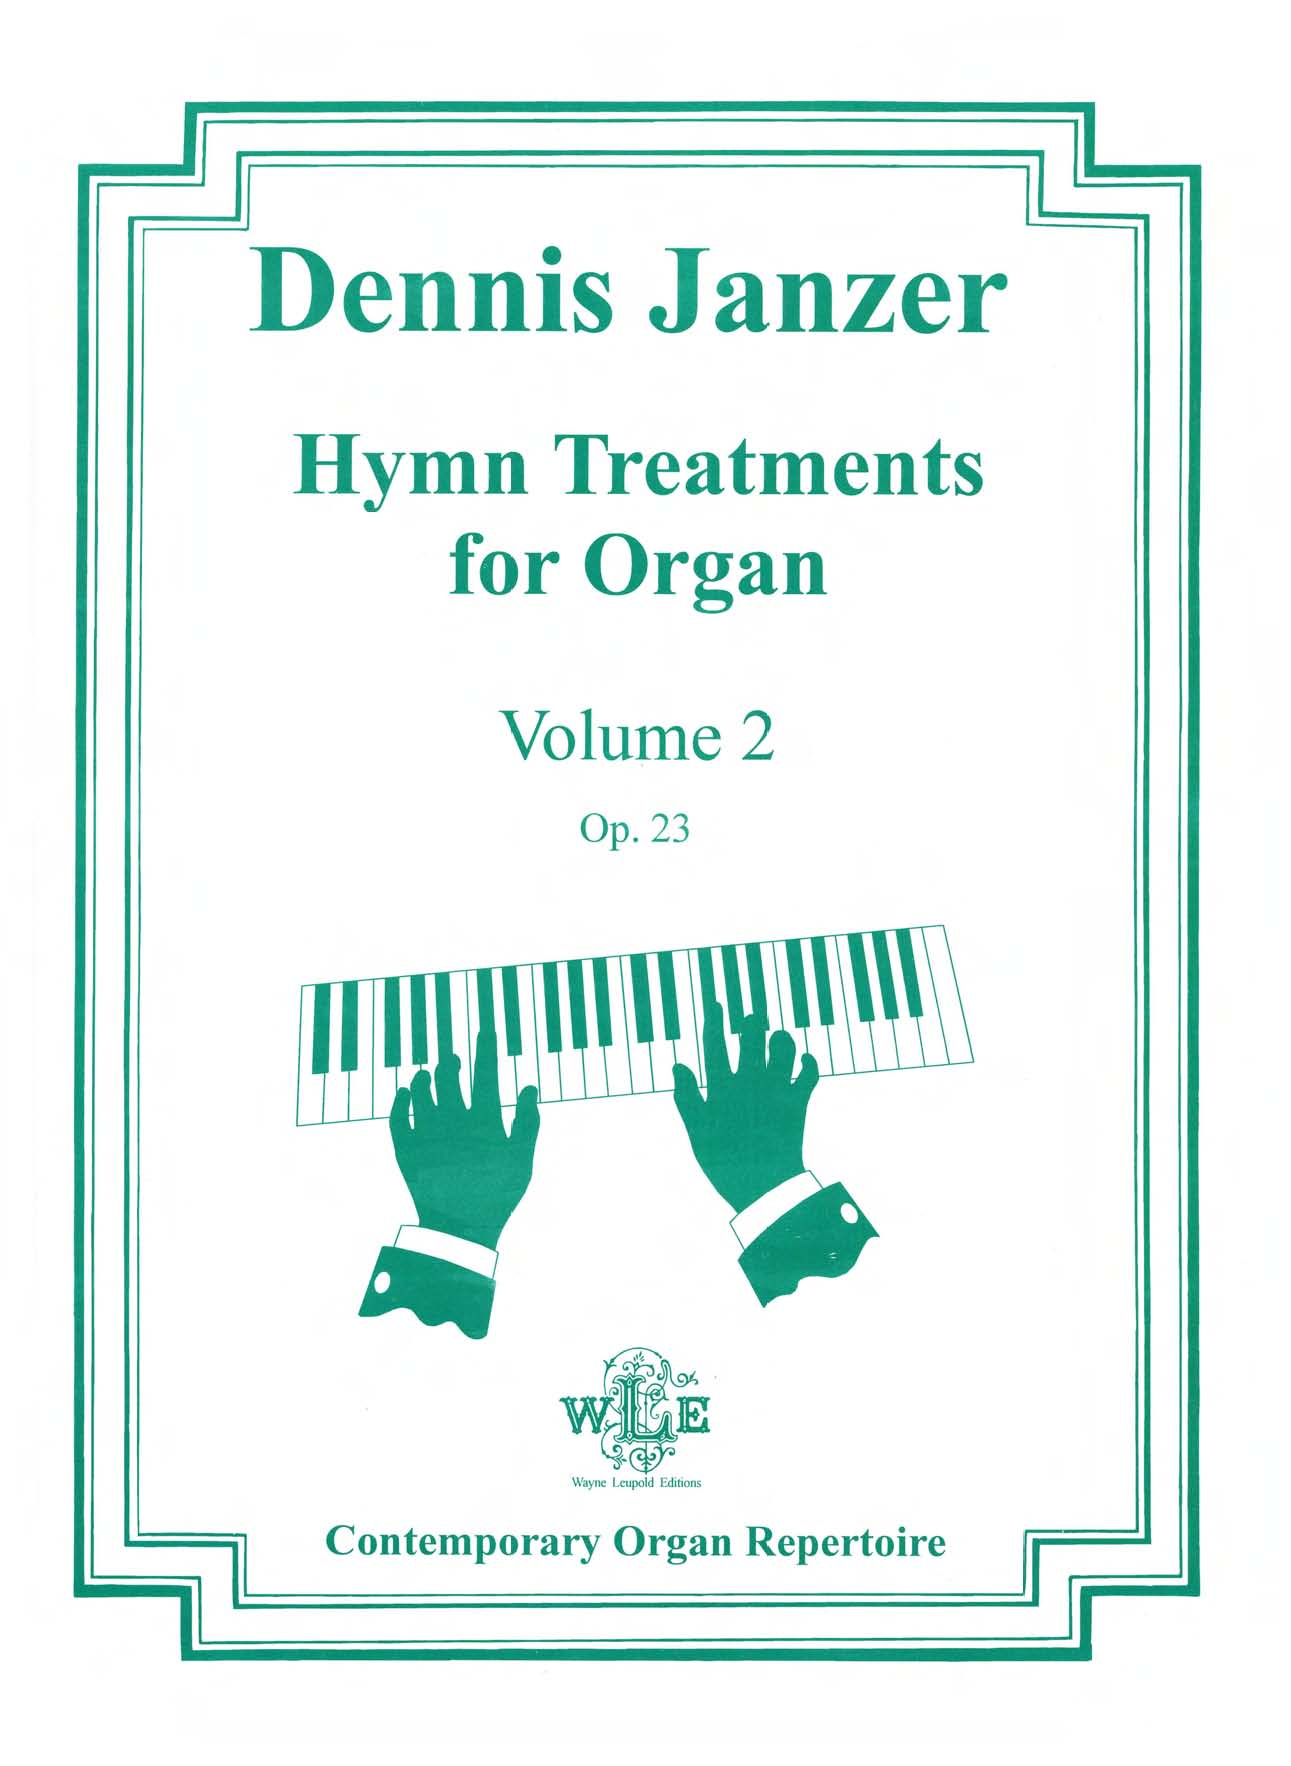 Hymn Treatments for Organ, Volume 2, Op. 23 - Dennis Janzer